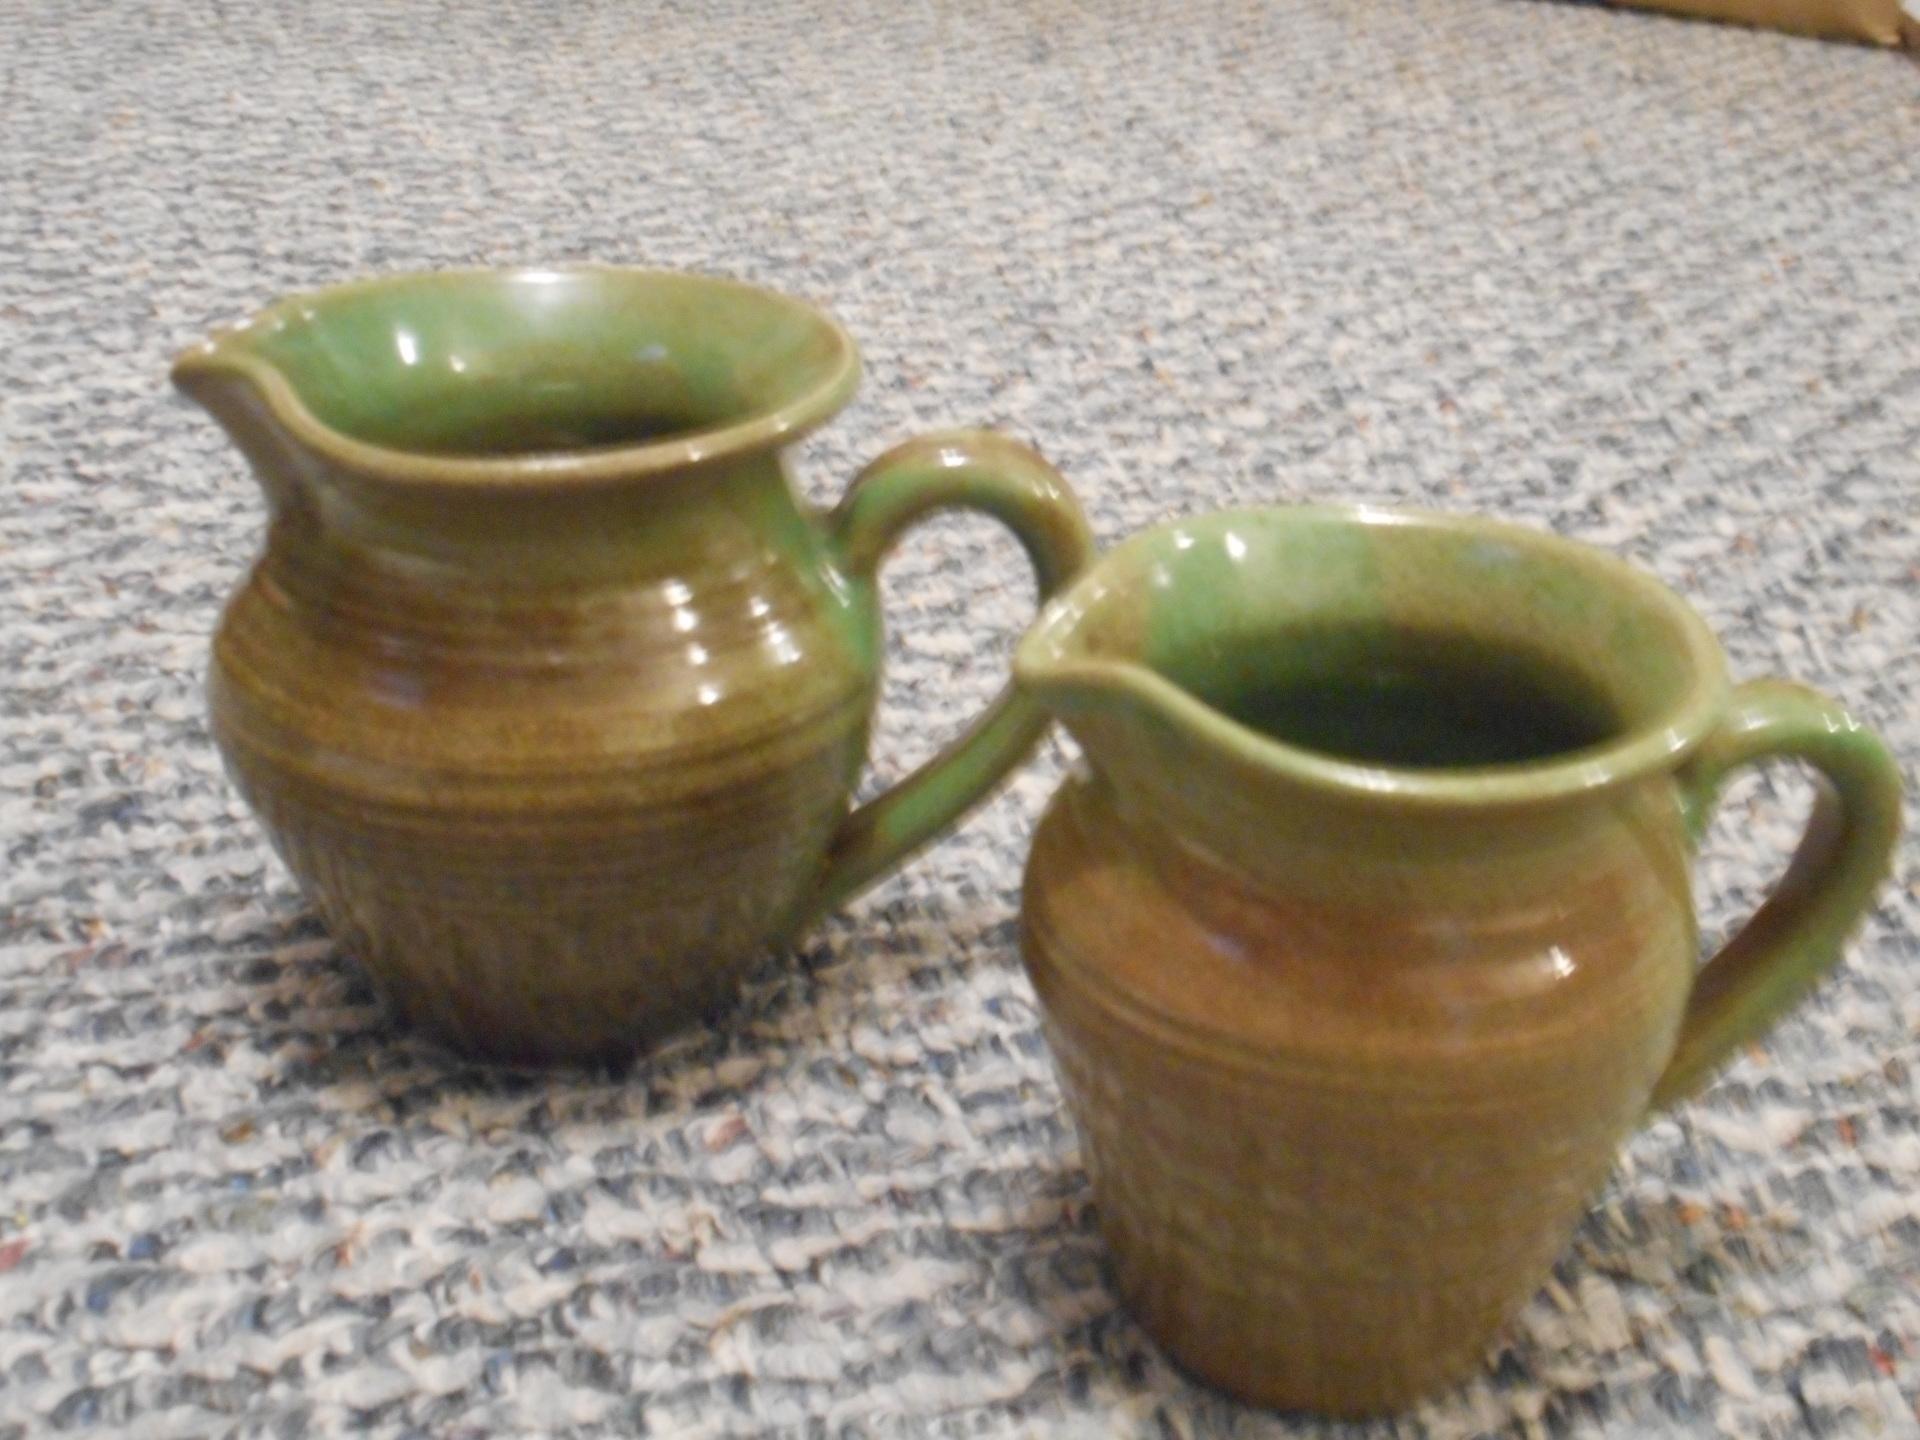 Green/Brown Earthenware Sugar and Creamer Set